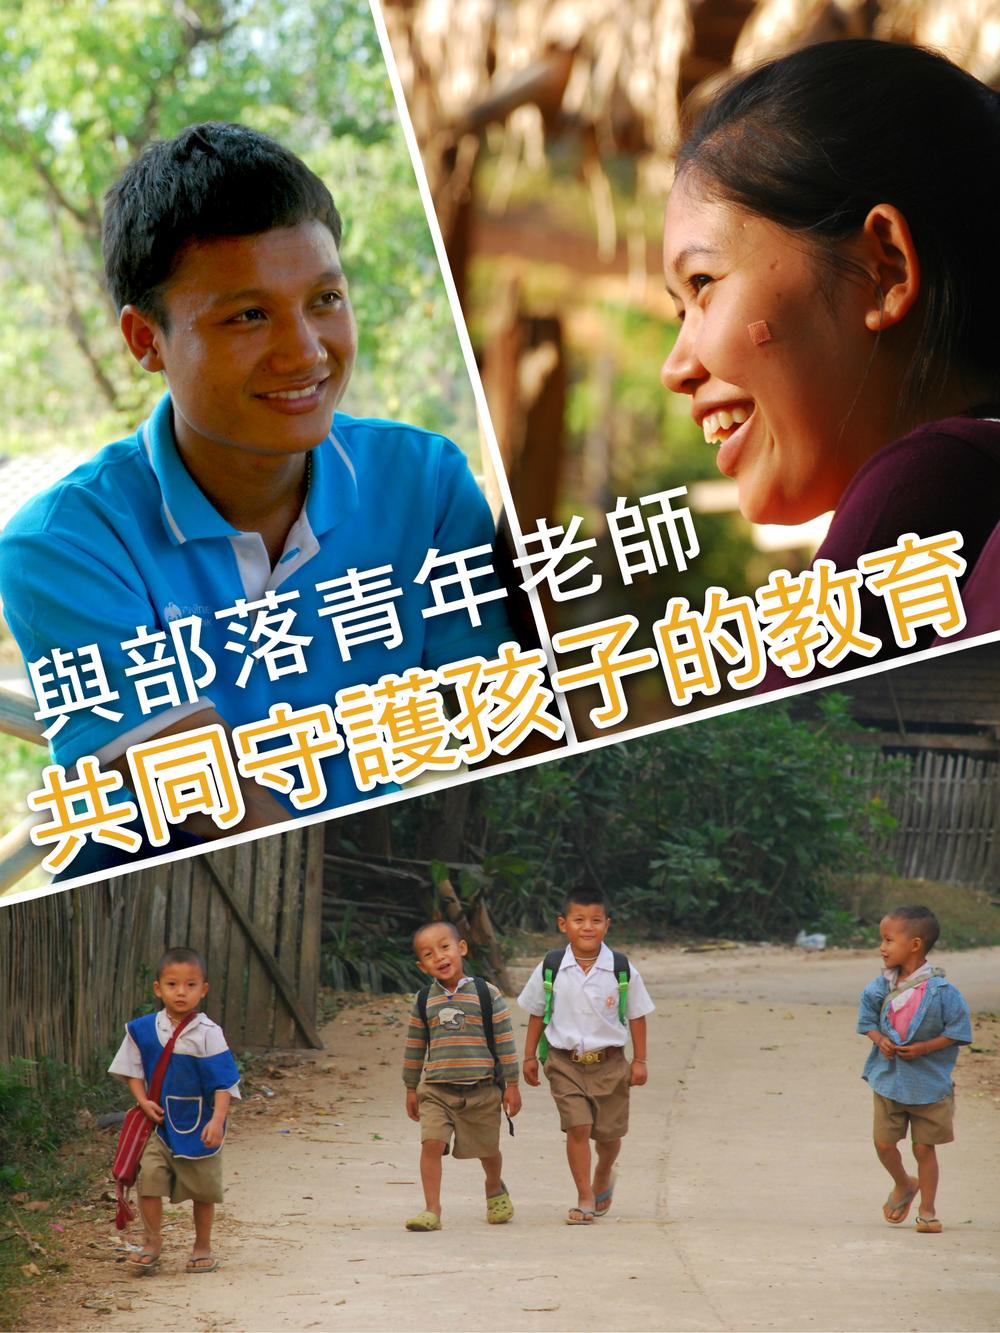 Mae Po Kee 部落的 Duangnet 老師,Sor Kae Klar 部落的 Wanaree 老師,與部落的孩子們。